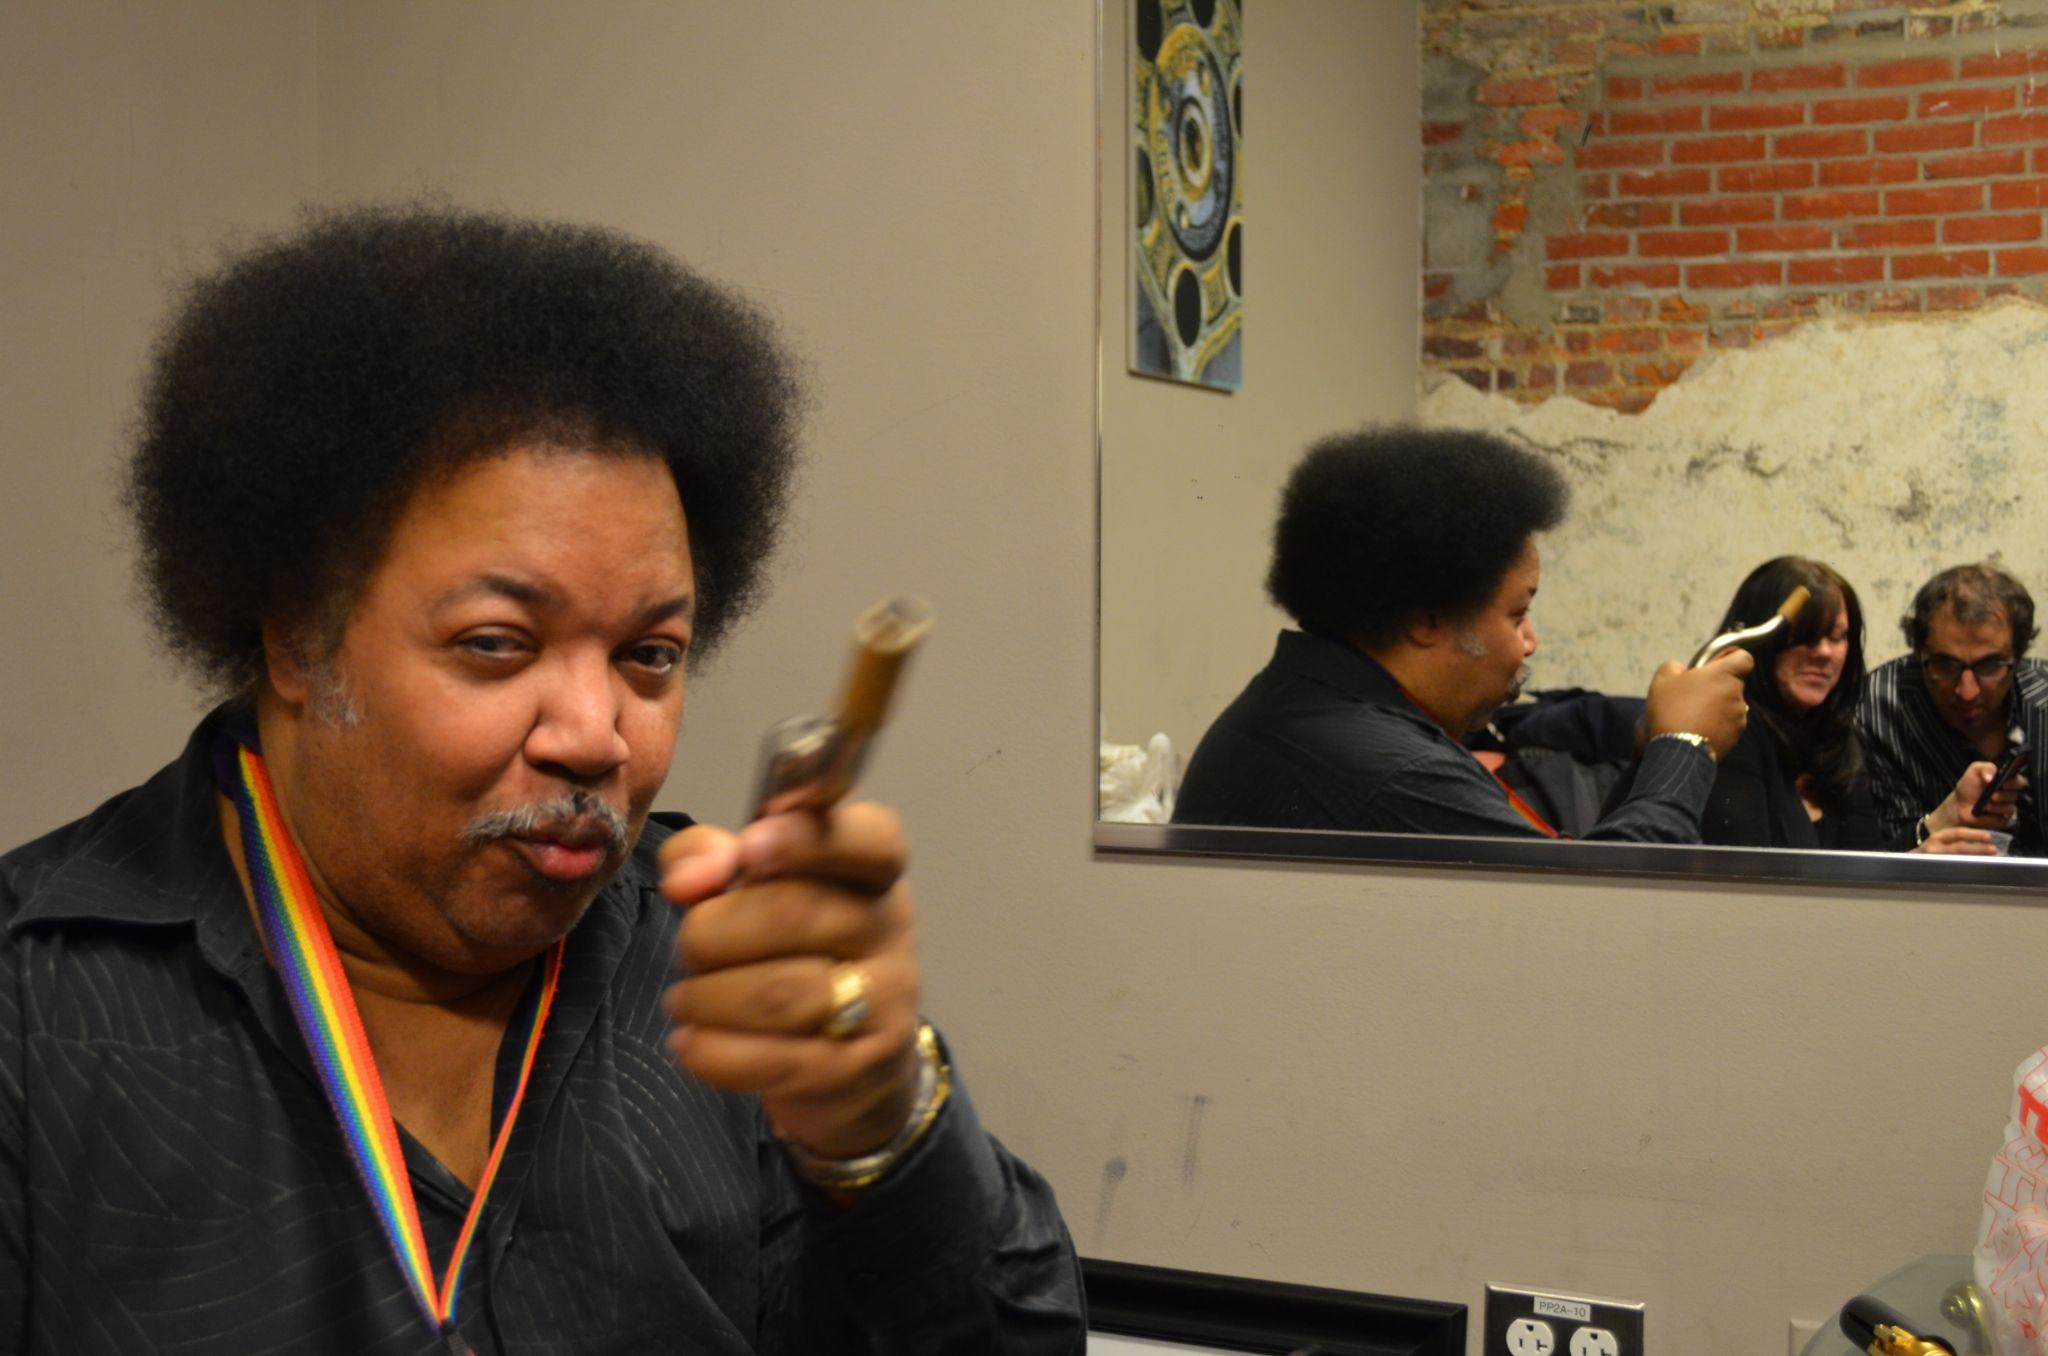 Ron Holloway: Dizzie Gillespie's sax player by RockFishPhotography21037